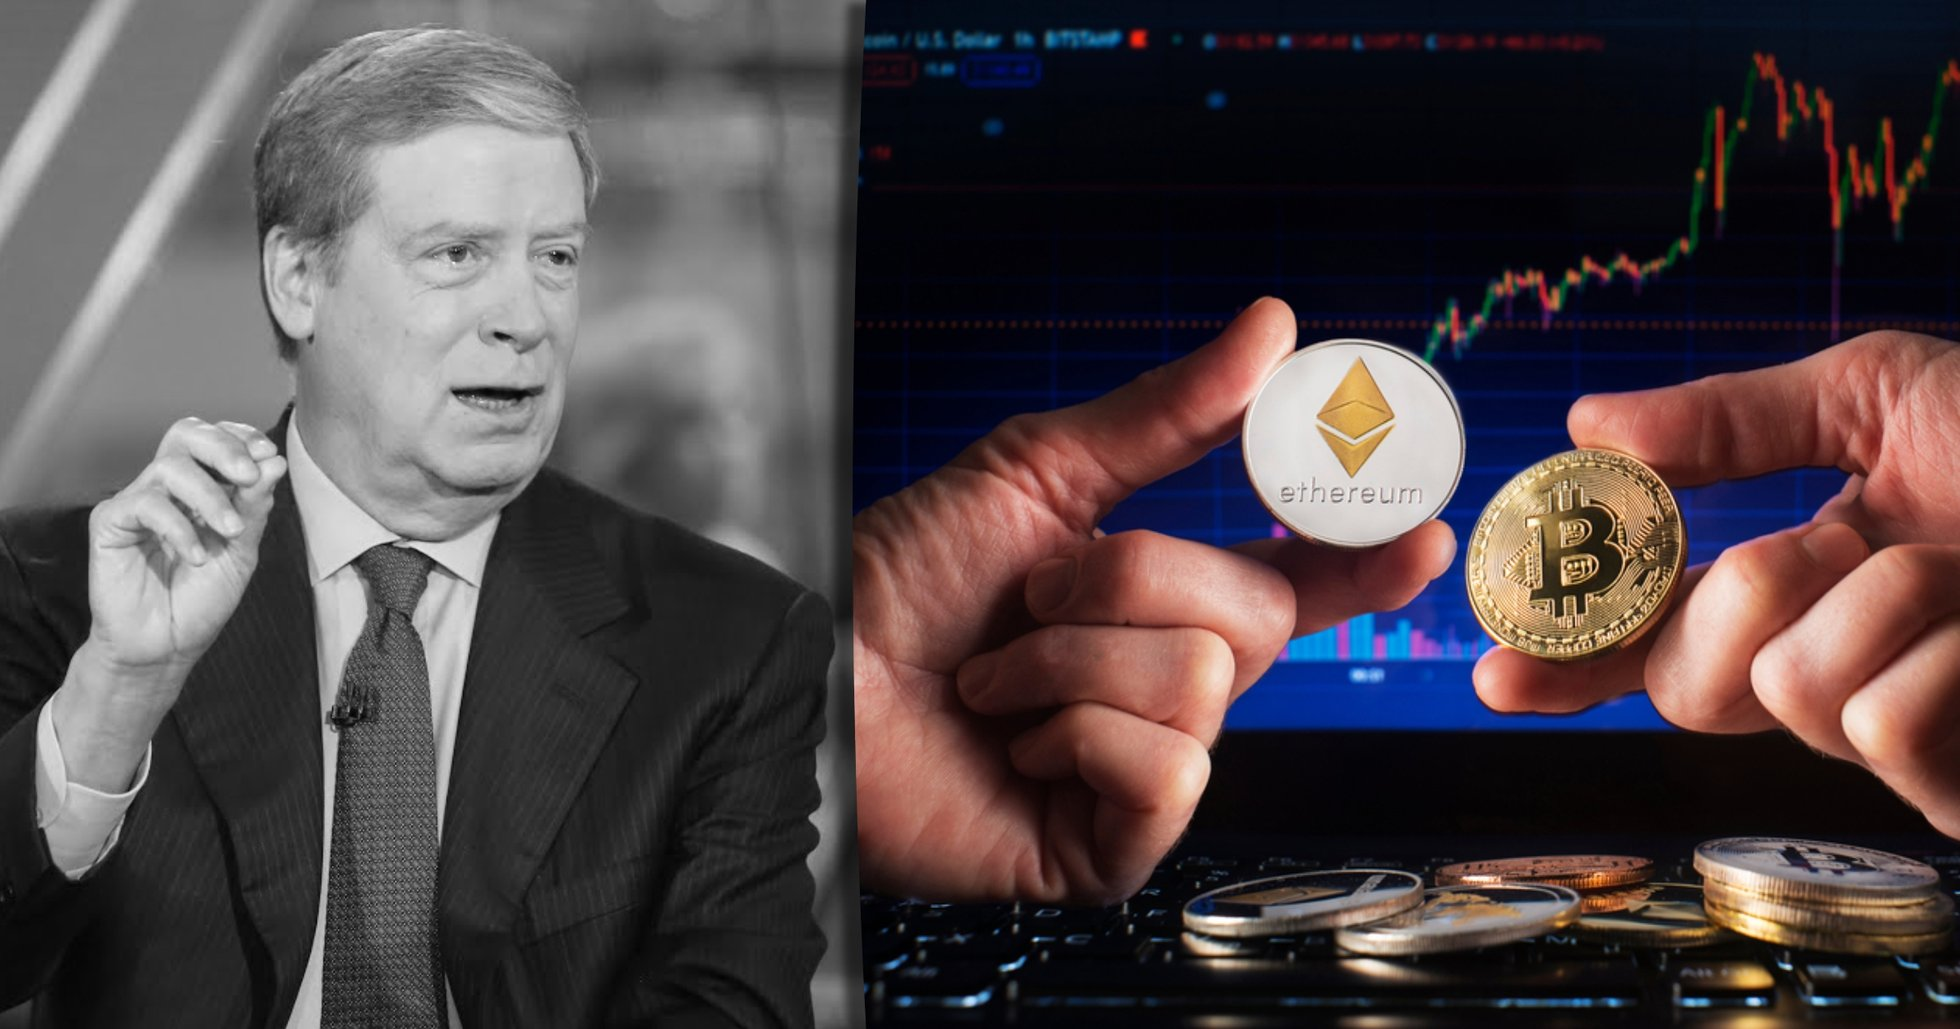 Kan ethereum gå om bitcoin? Miljardären Stanley Druckenmiller tror inte det